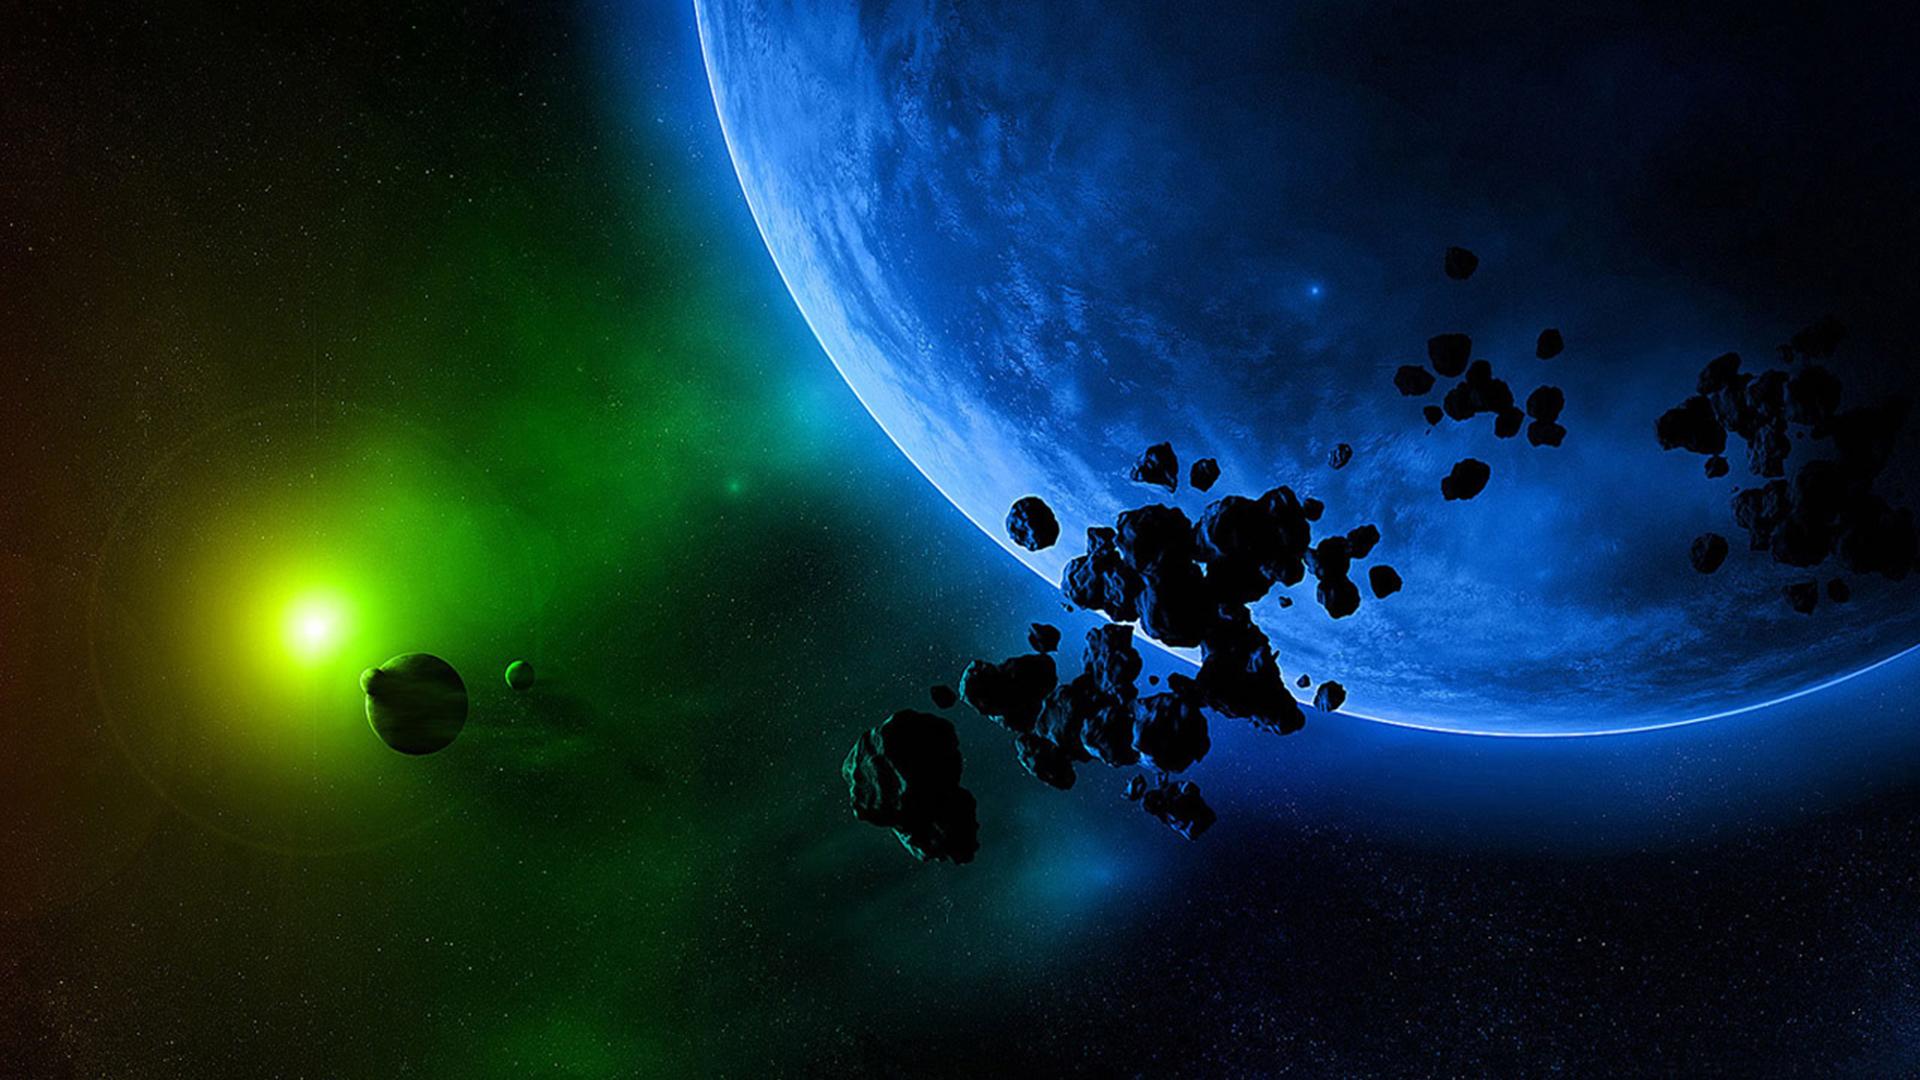 espace-252-espace-univers-art-digital.jpg